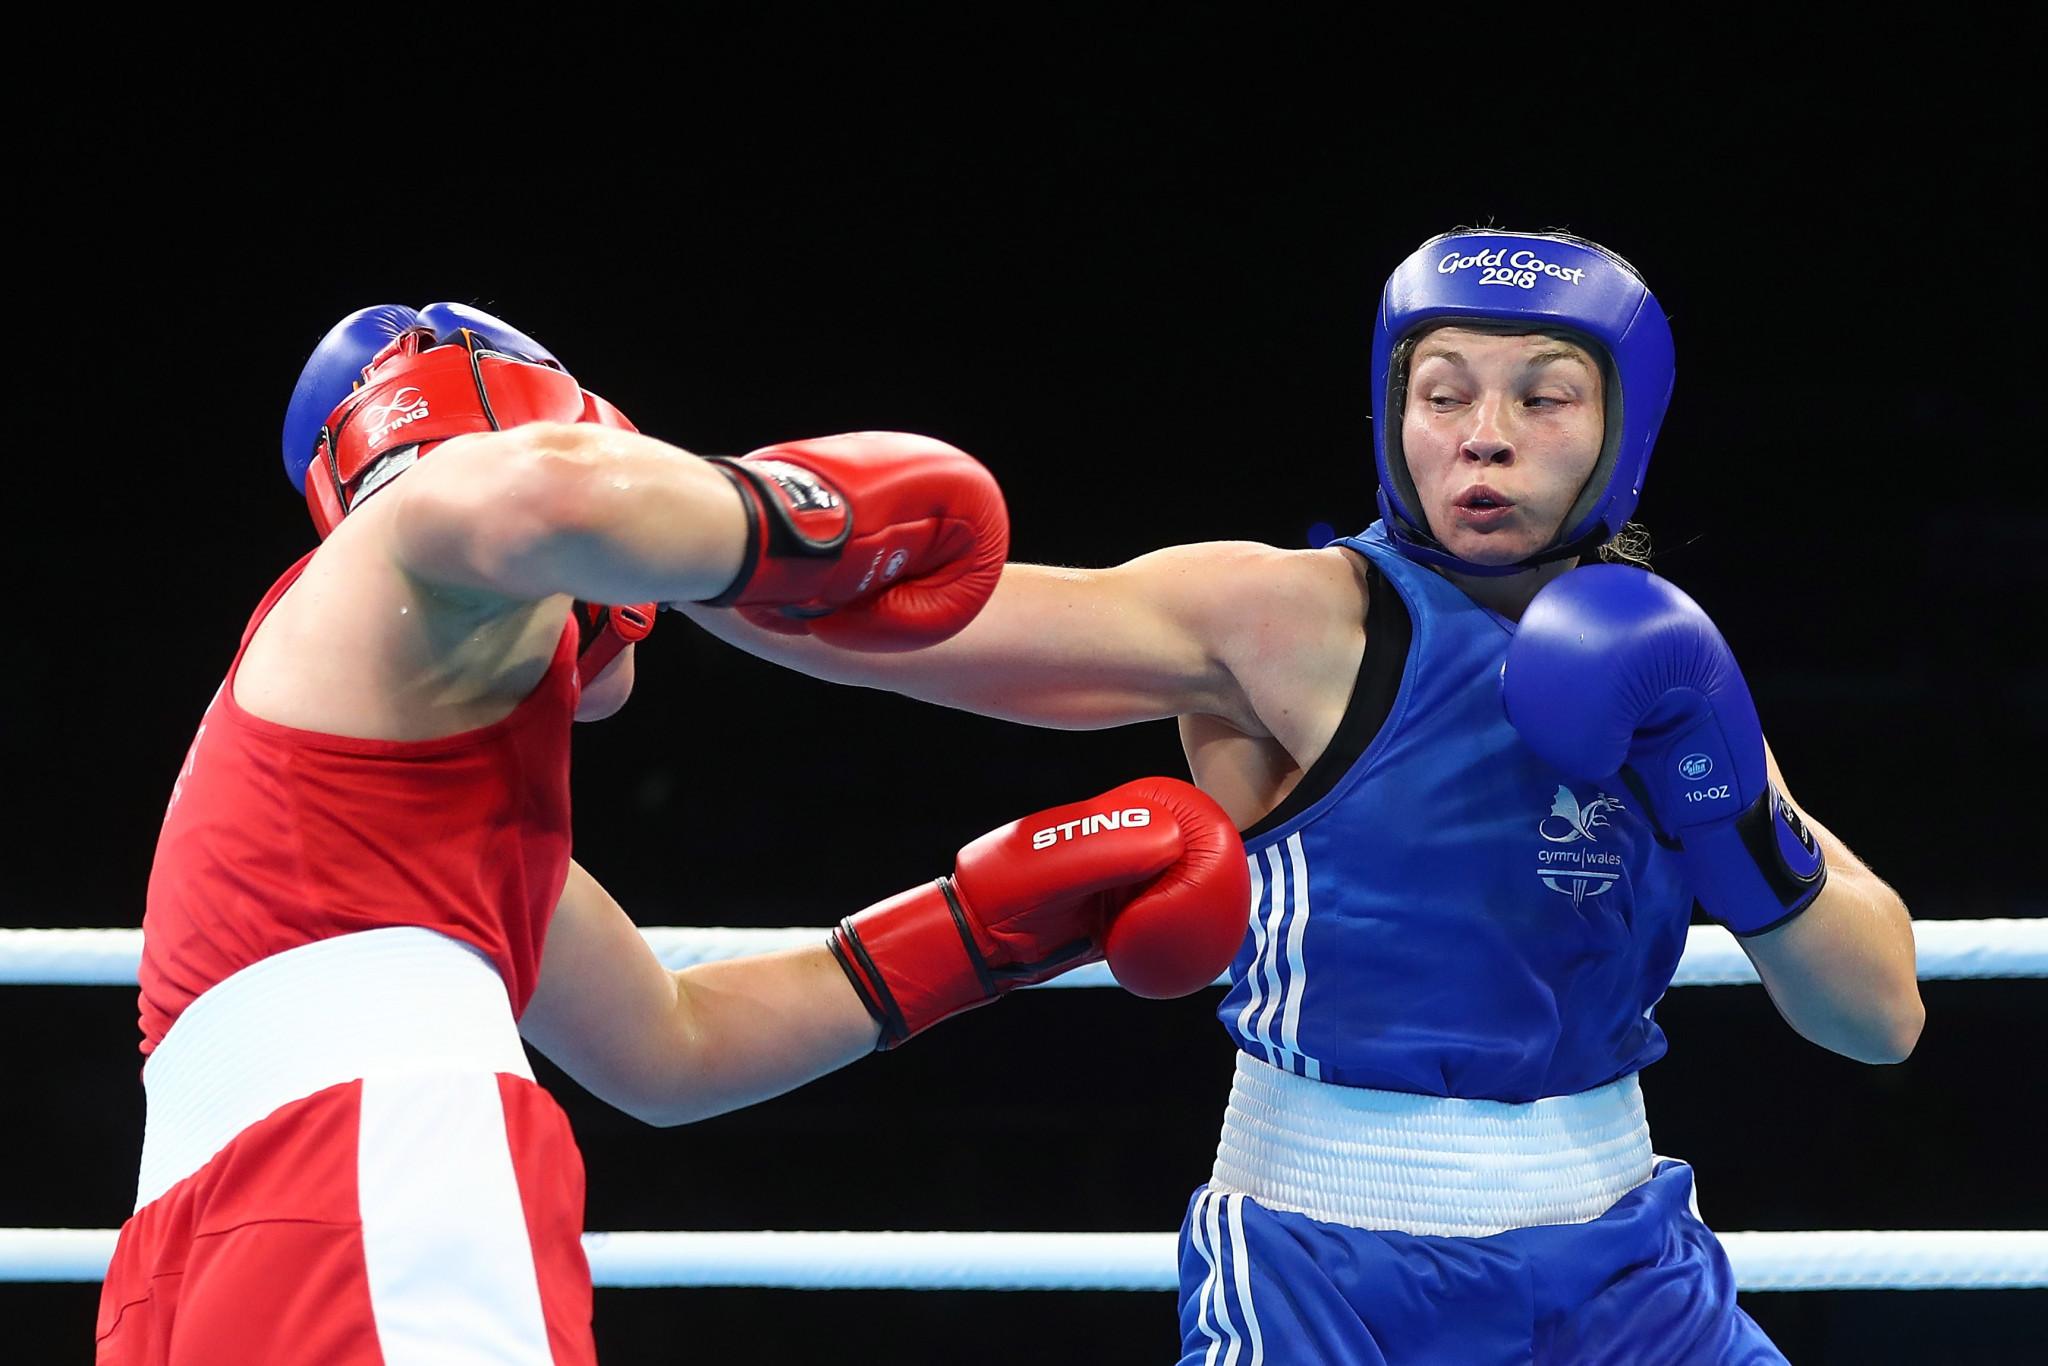 Commonwealth champion Price reaches AIBA Women's World Boxing Championships semi-final